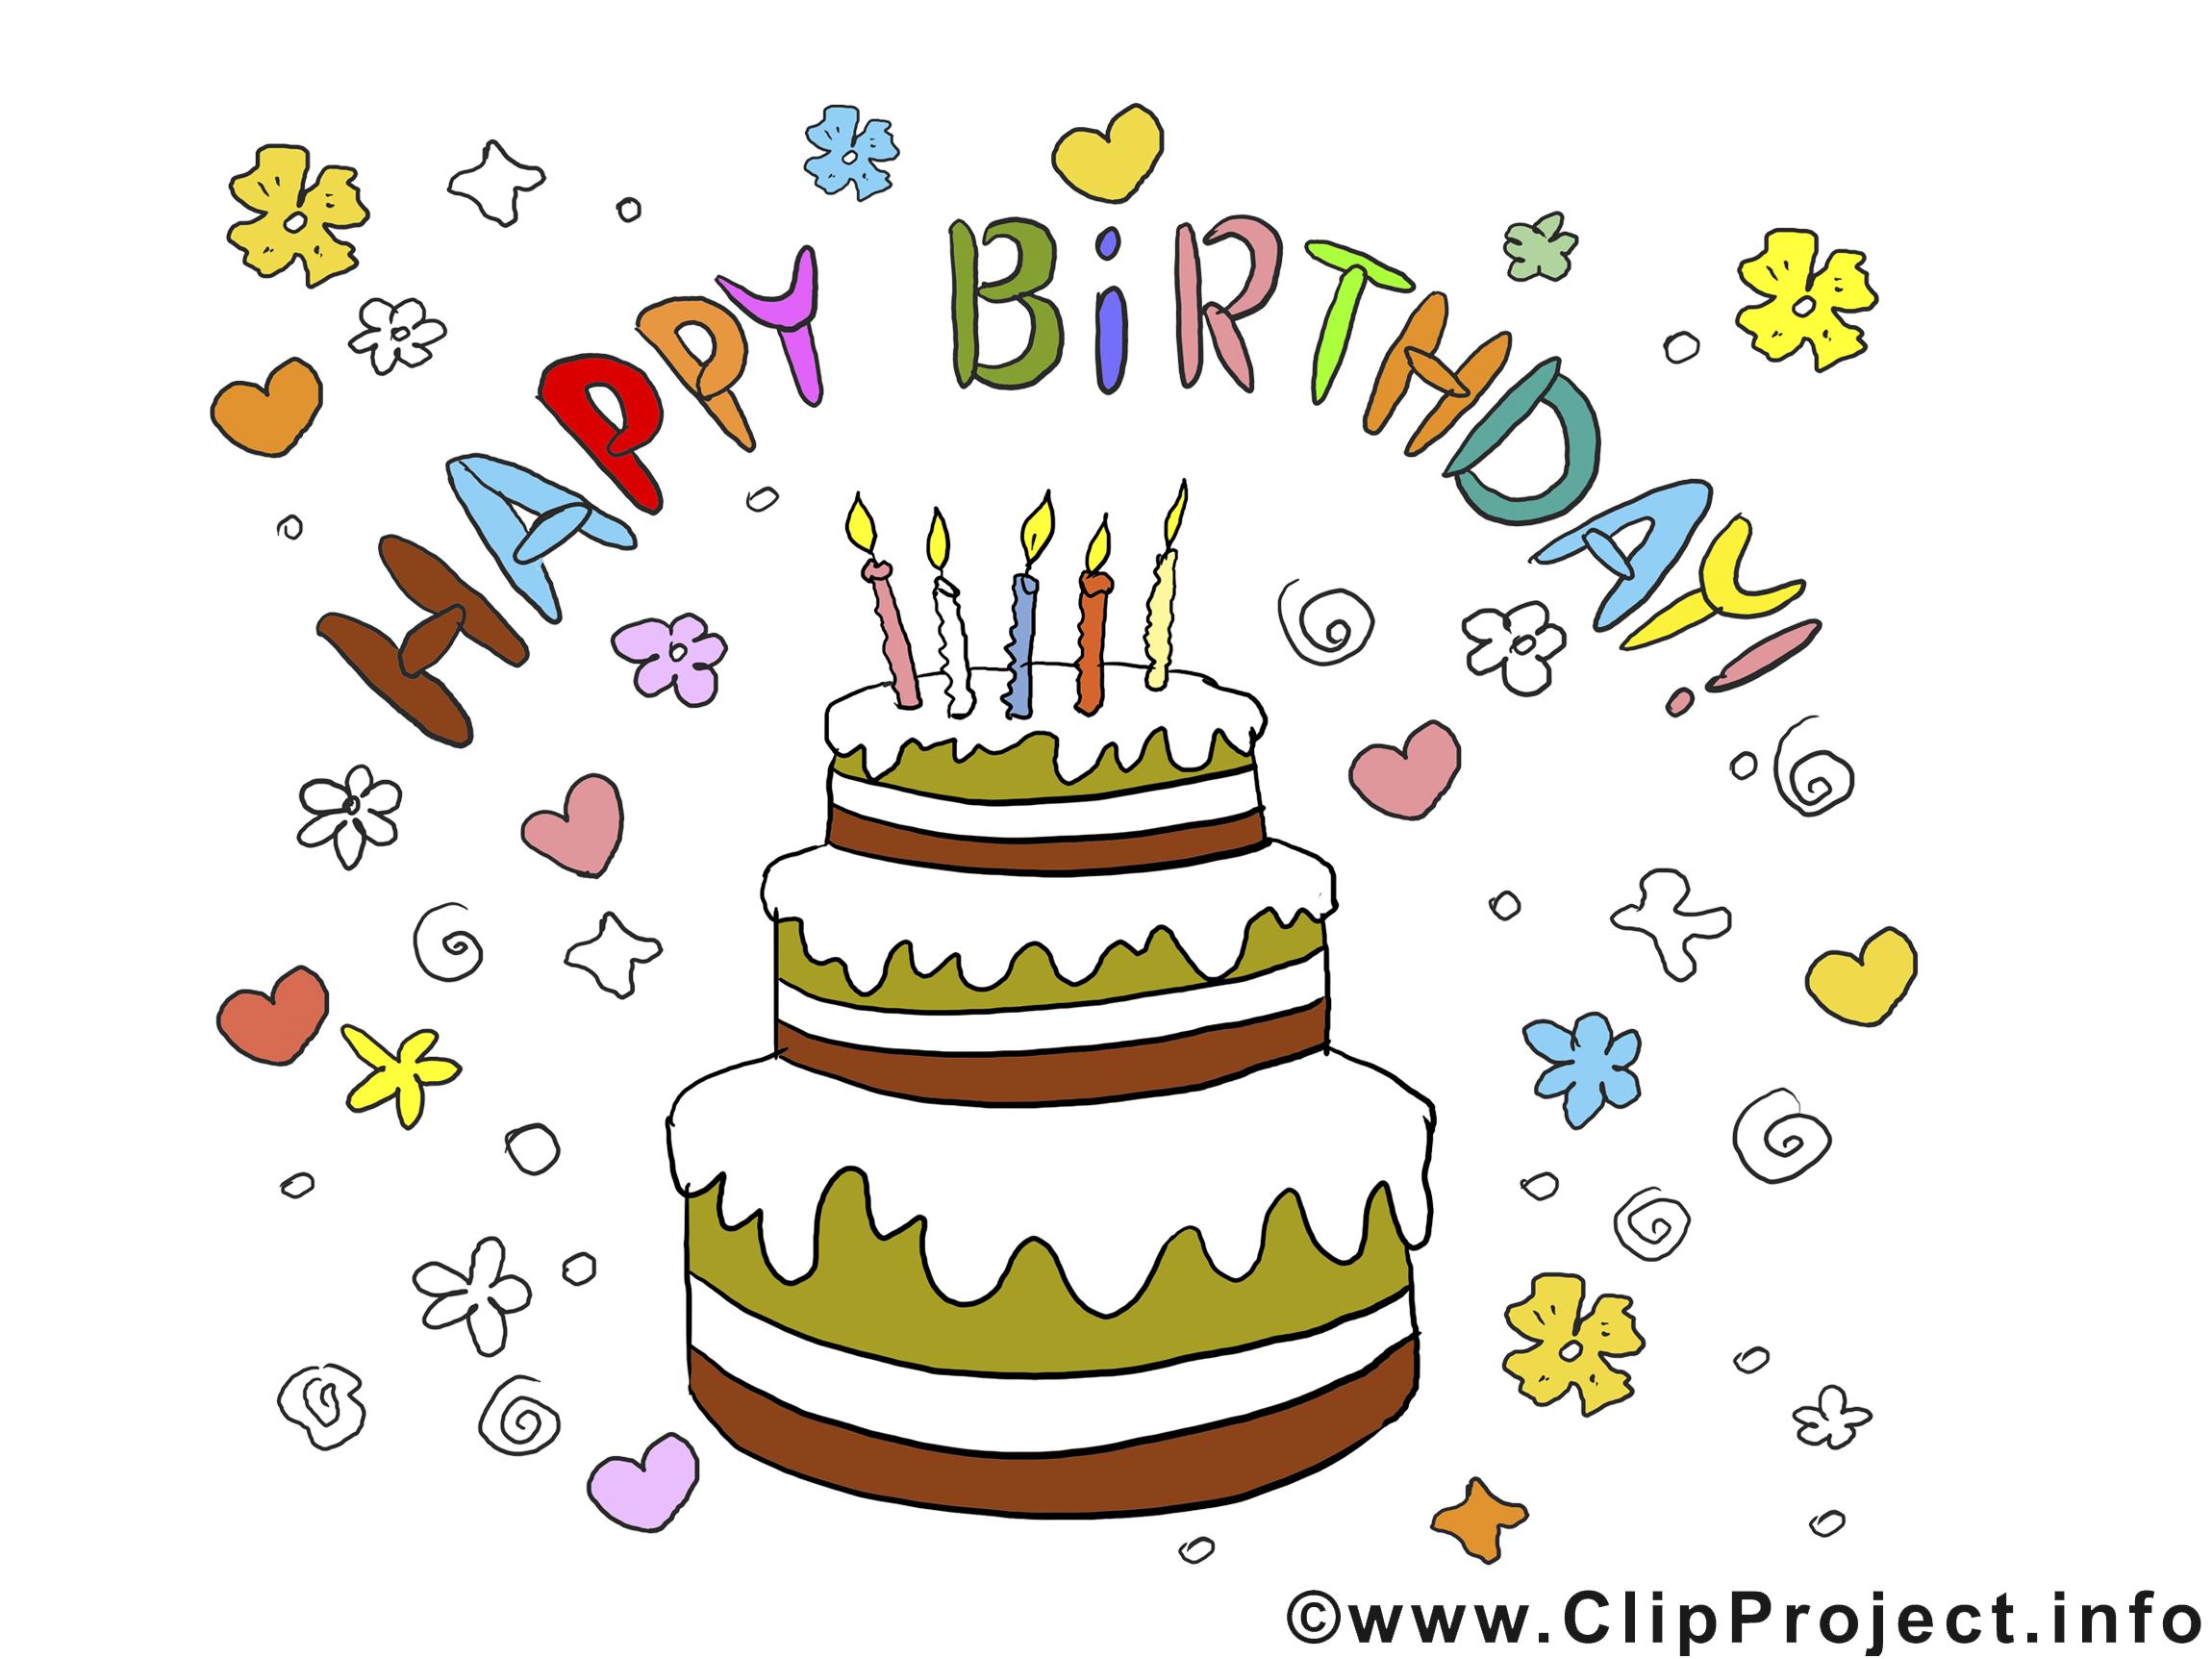 Geburtstag torte clipart jpg free stock Geburtstag Bilder, Cliparts, Cartoons, Grafiken, Illustrationen ... jpg free stock